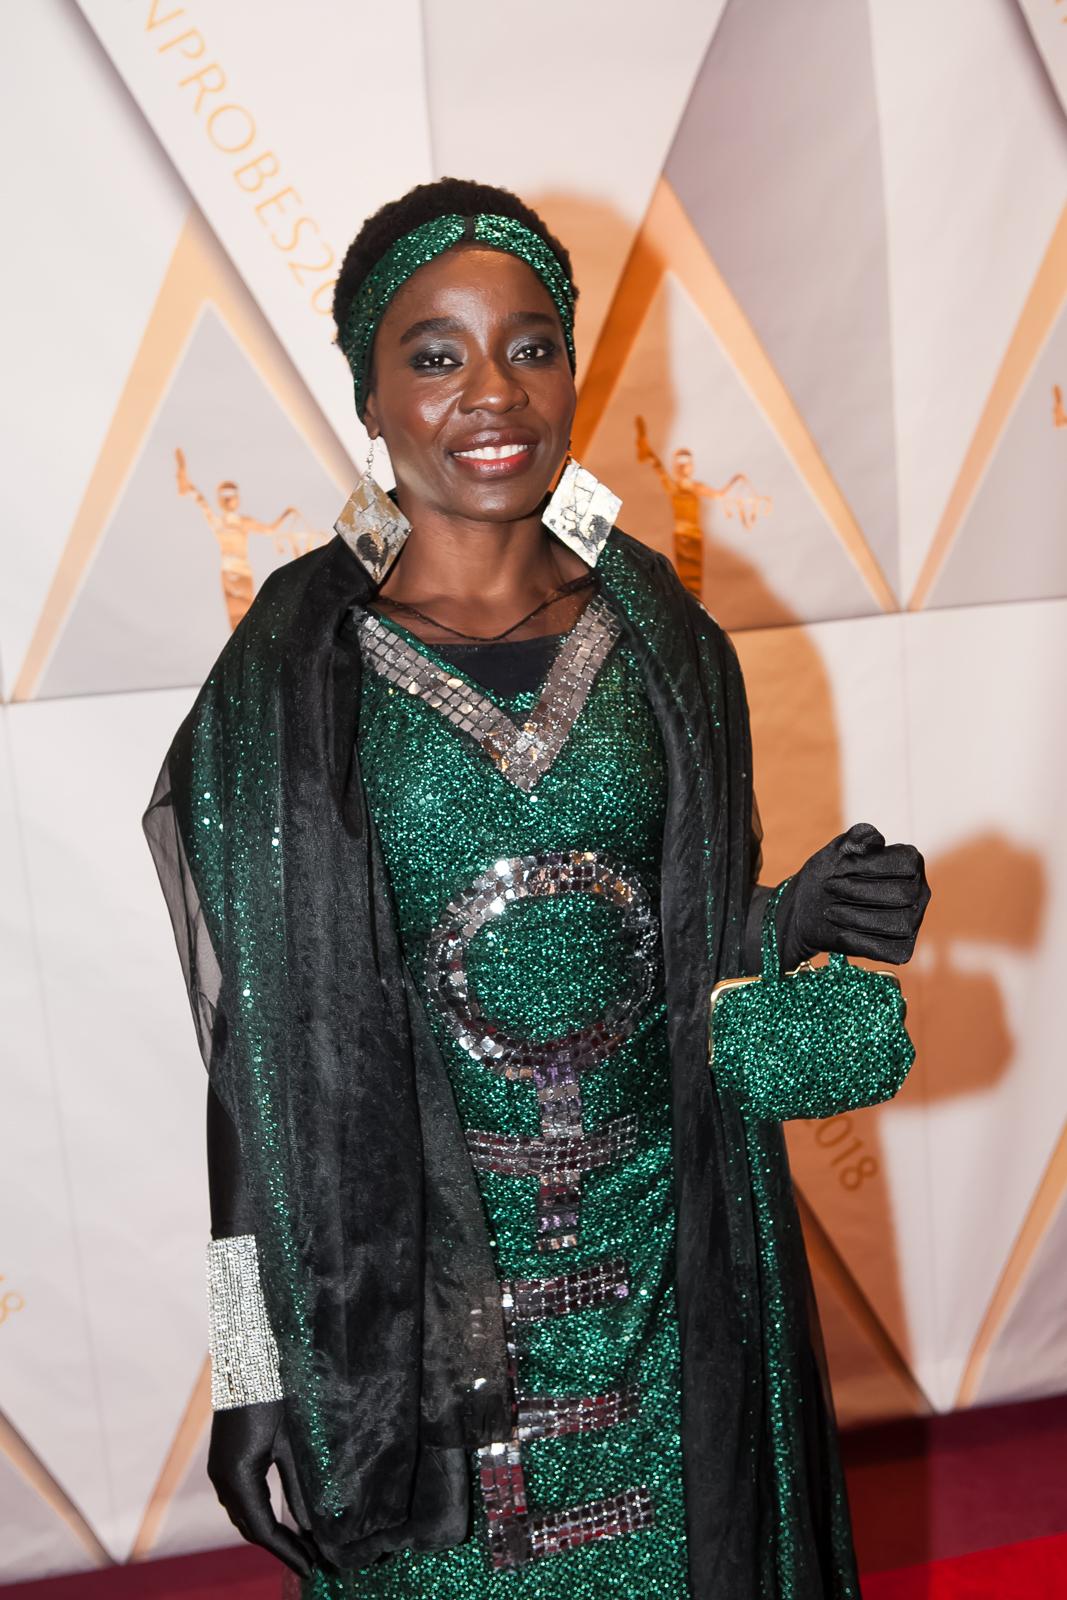 Patricia Okoumou